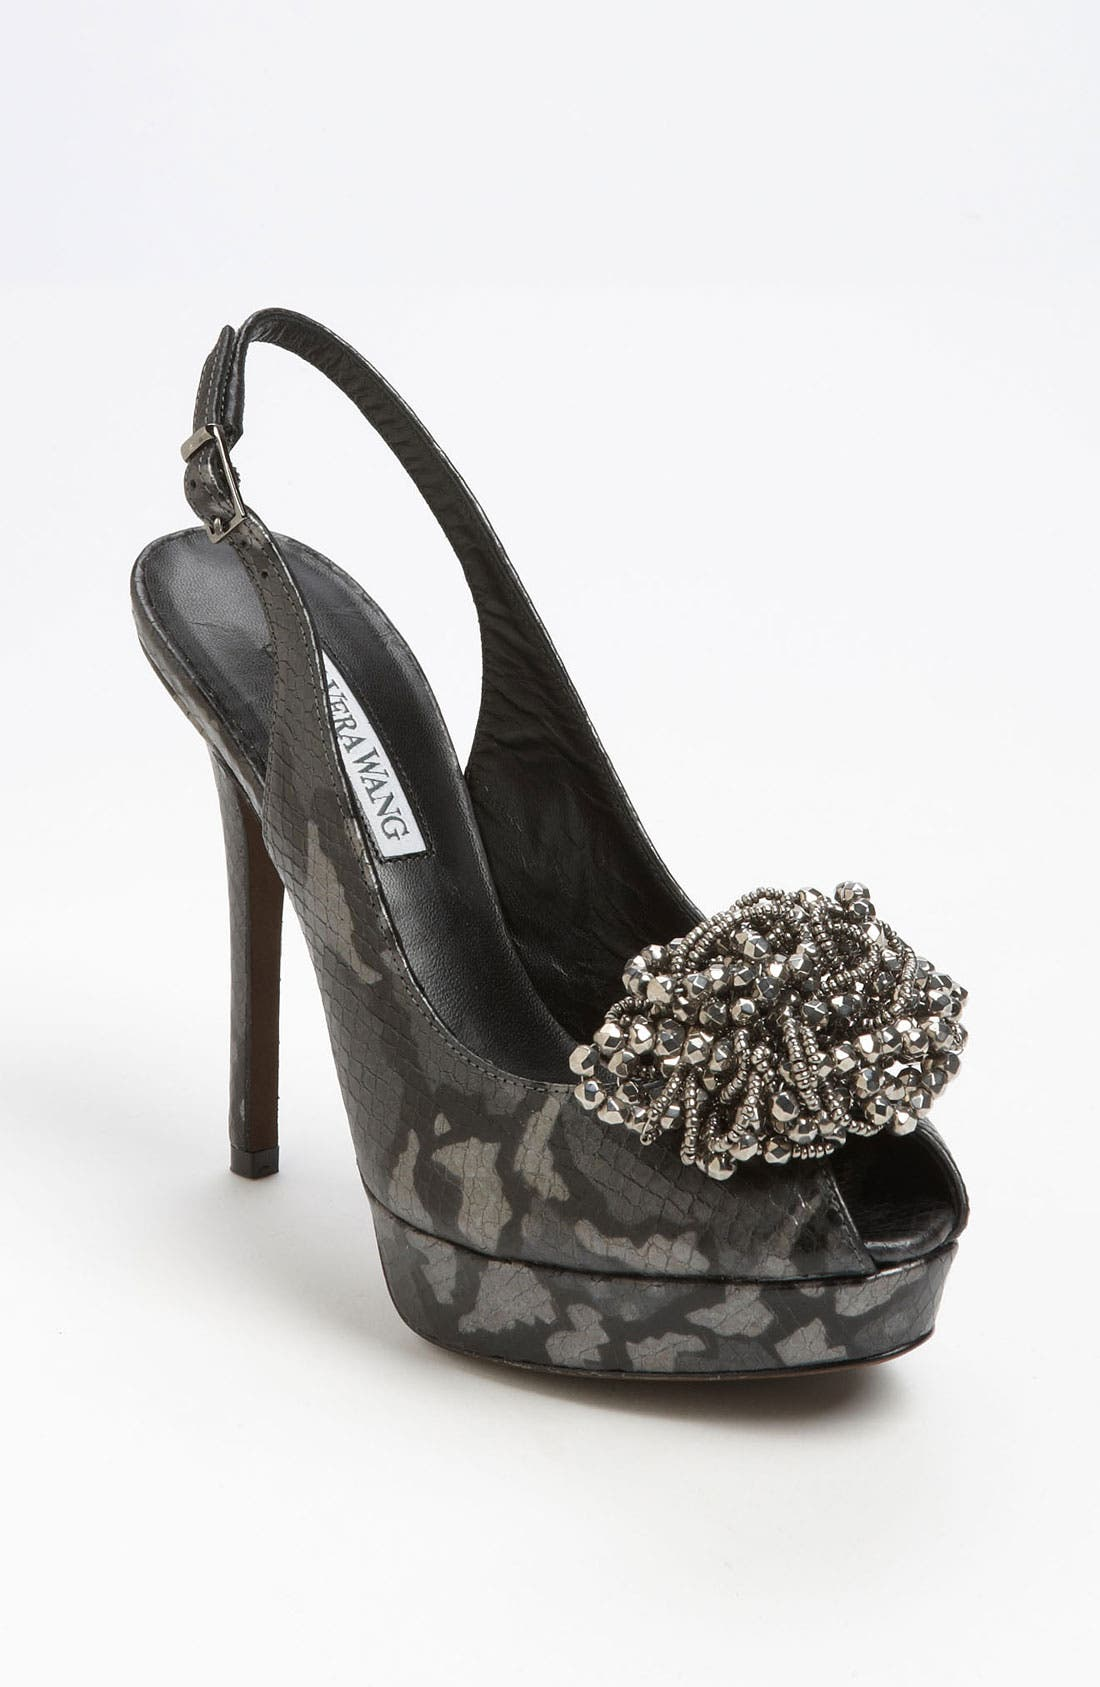 Alternate Image 1 Selected - Vera Wang Footwear 'Melody' Pump